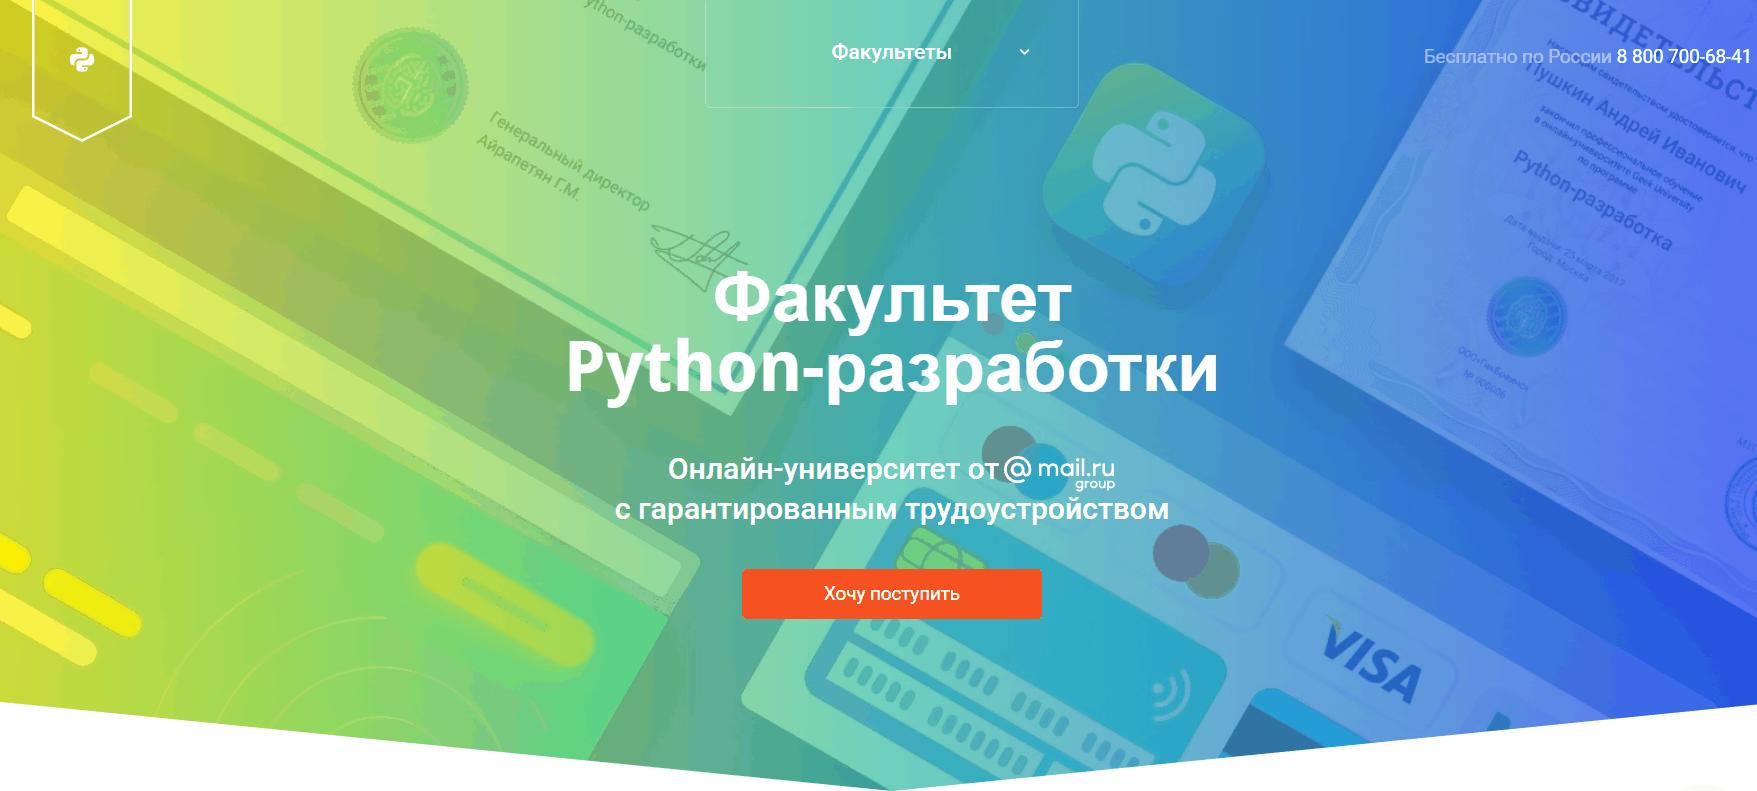 Факультет Python-разработки GeekBrains